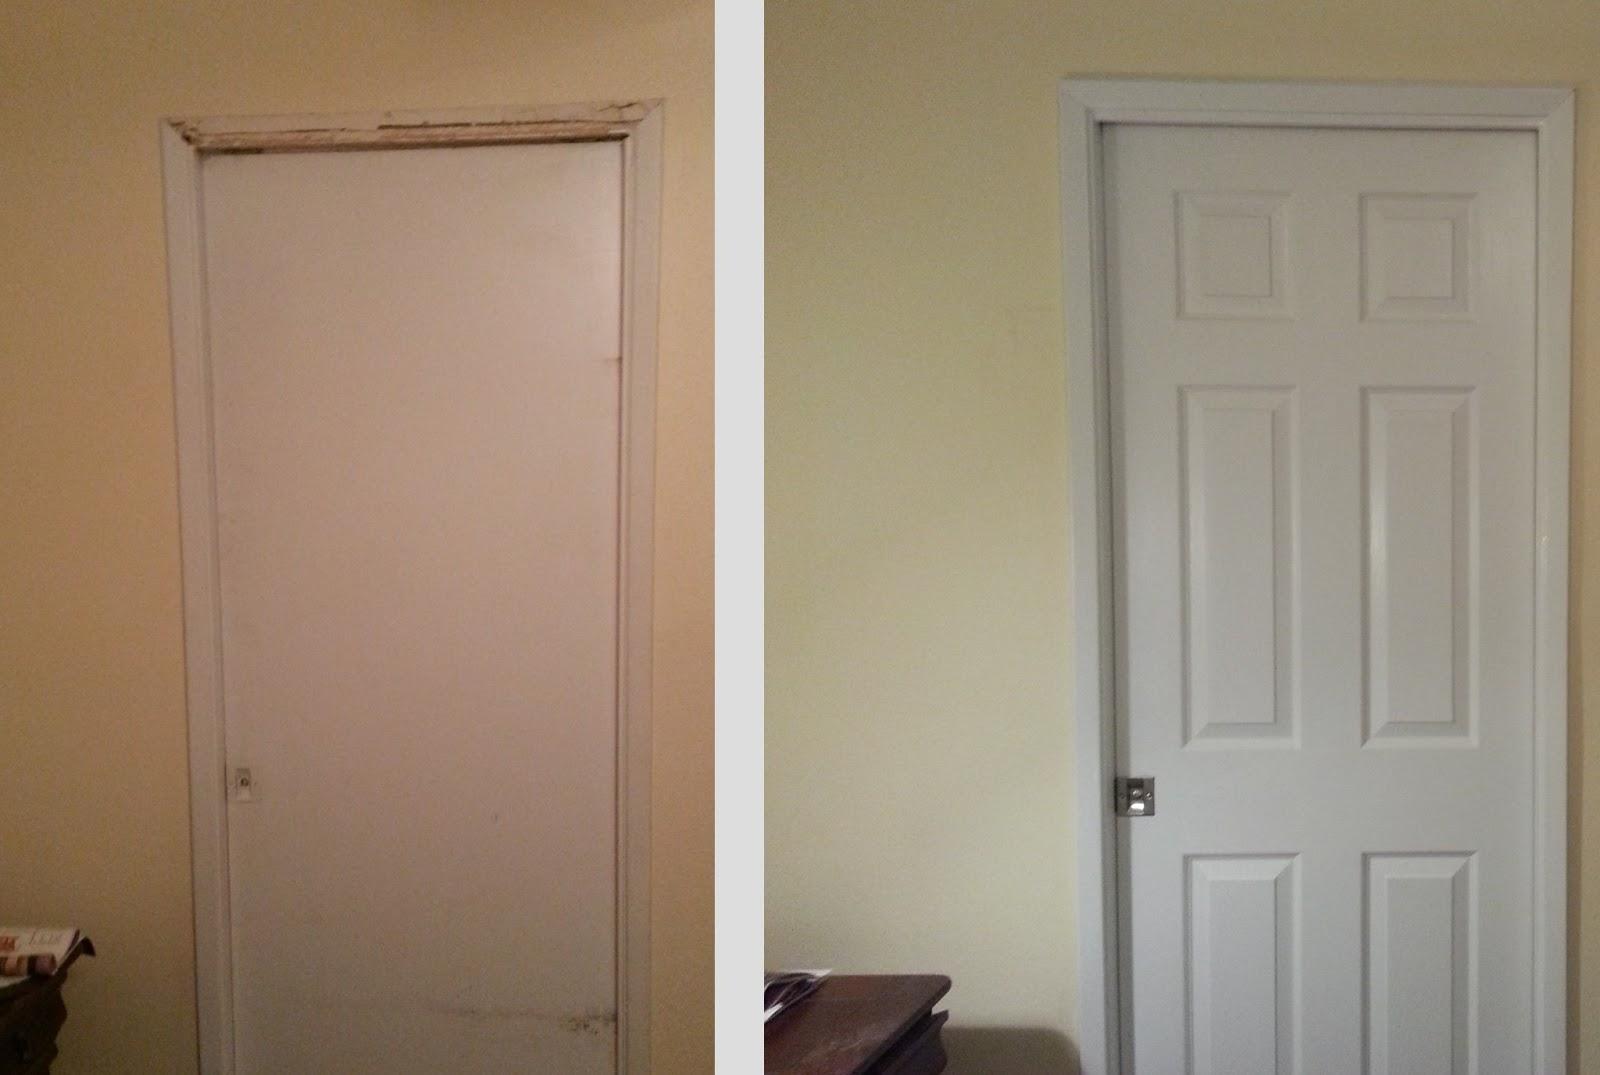 Superbe Pictures Of Hollow Interior Doors